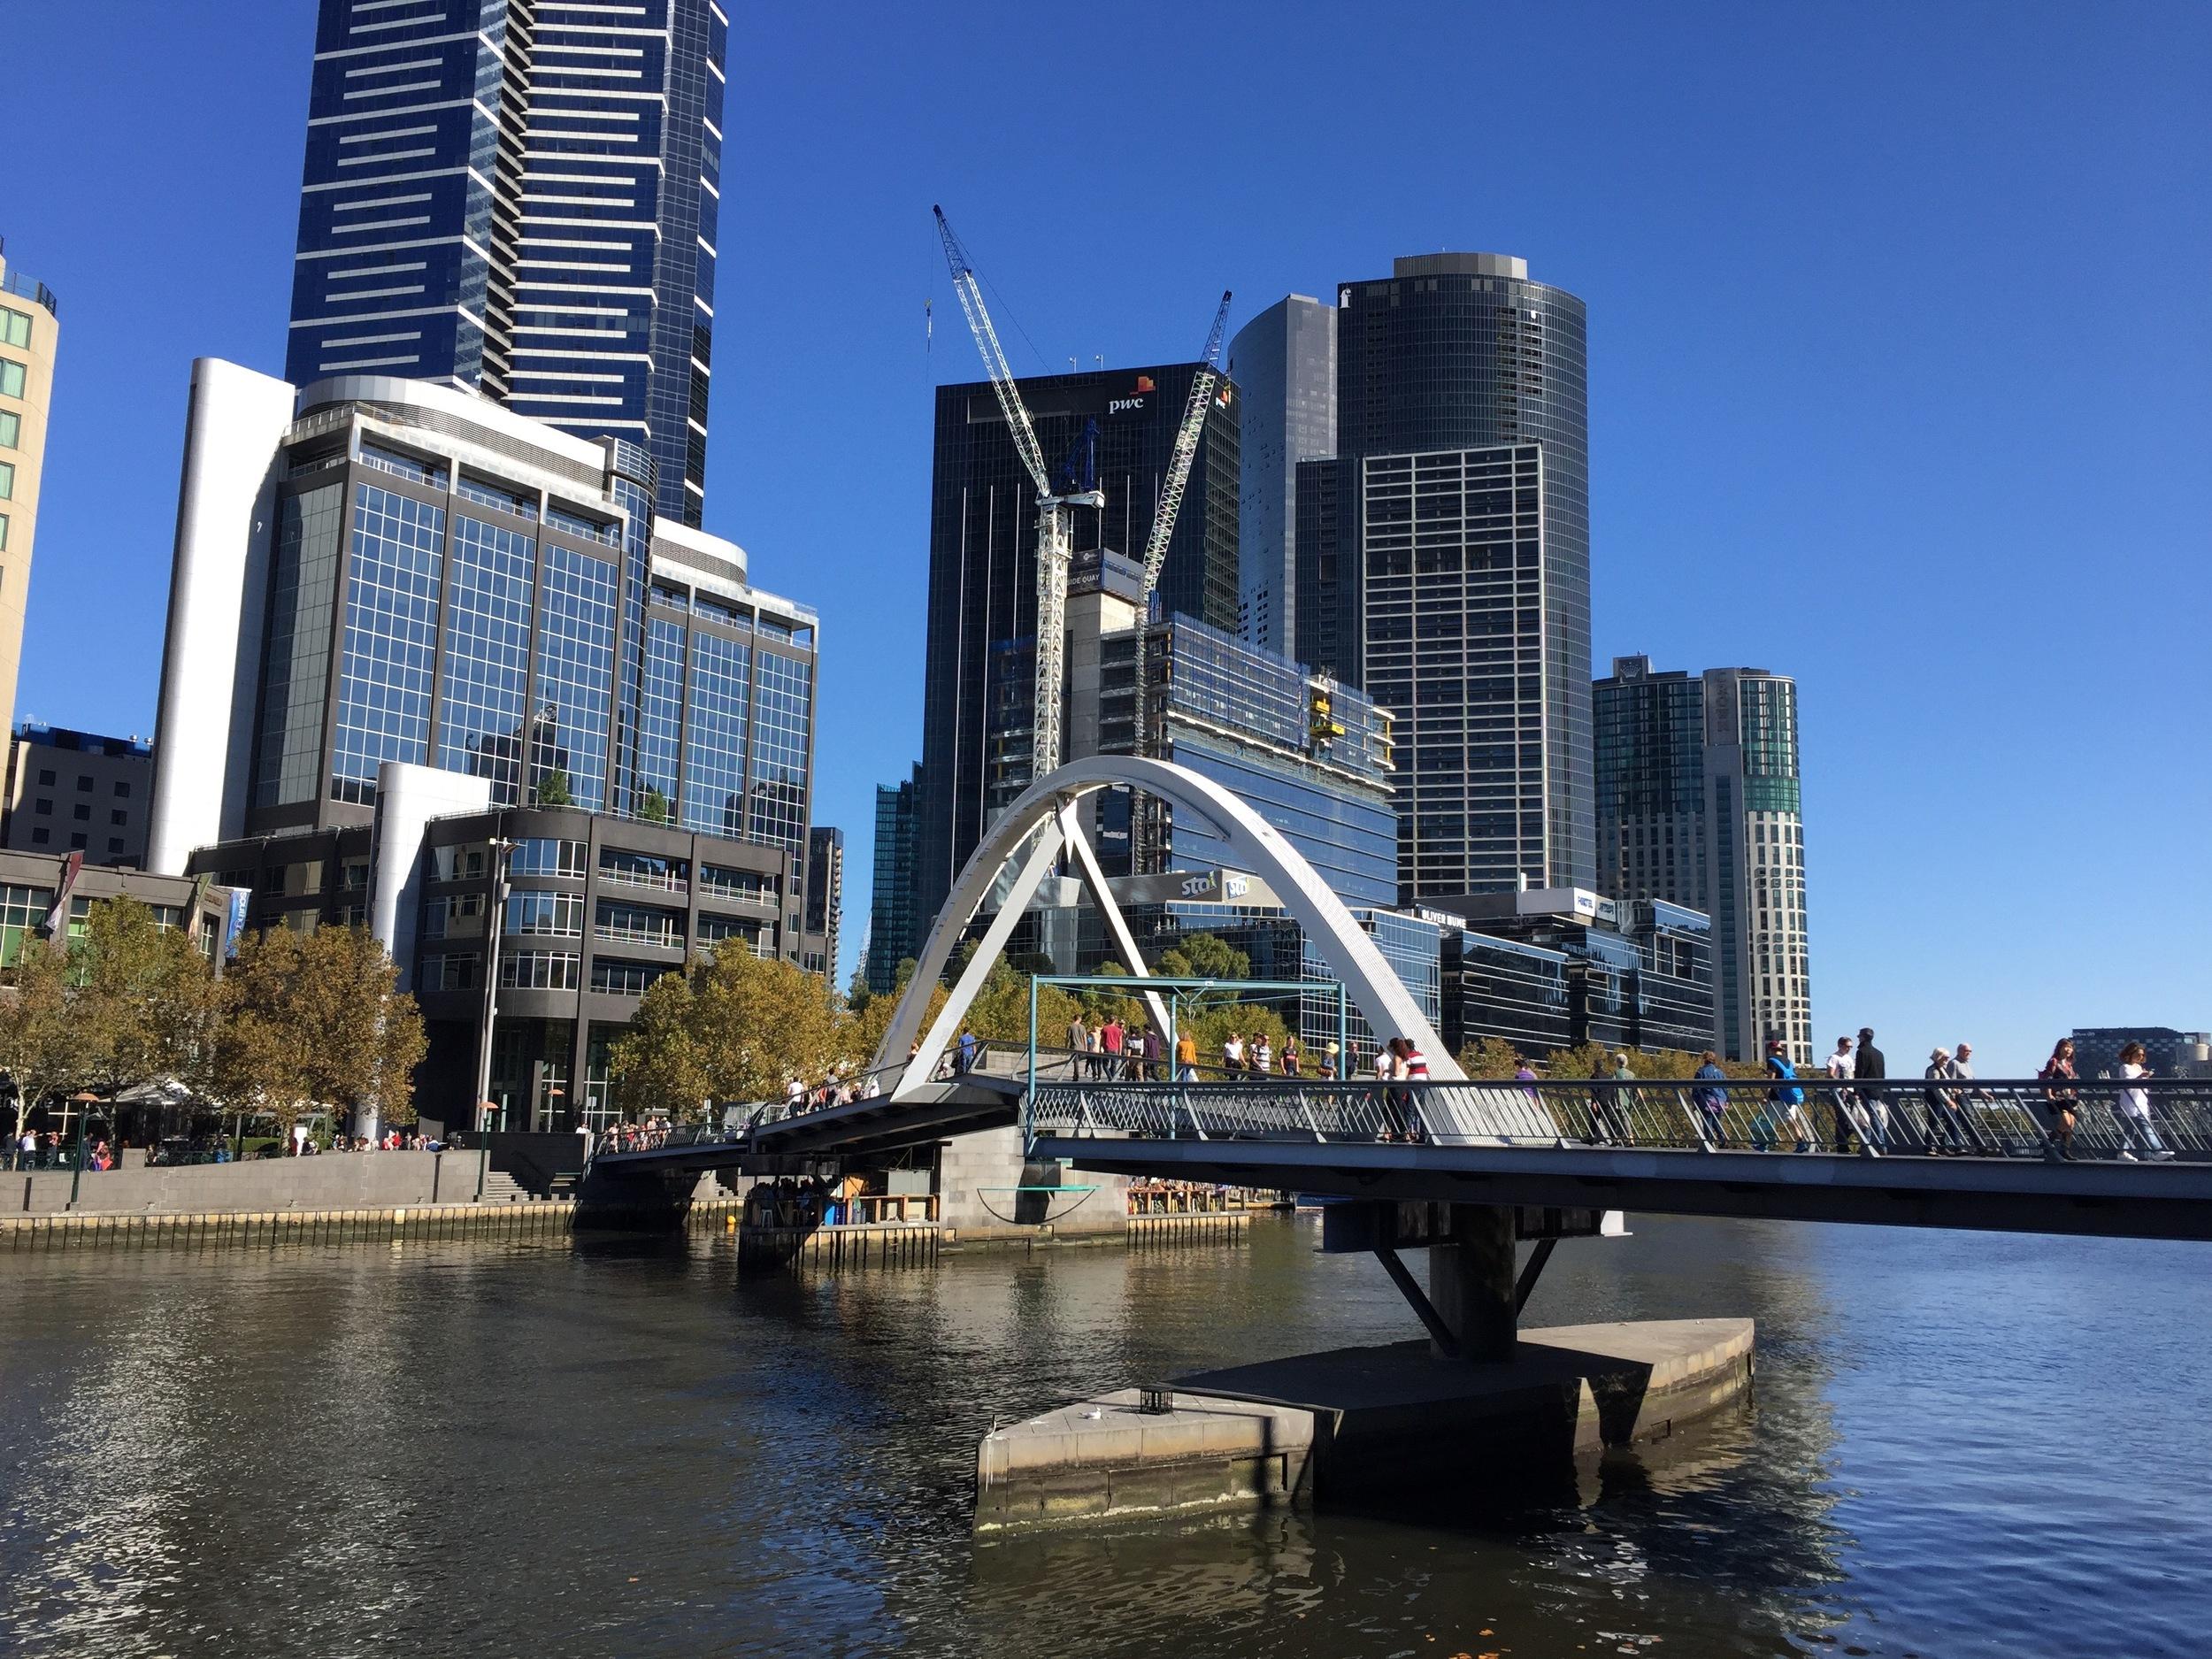 Yarra River Boat Tour